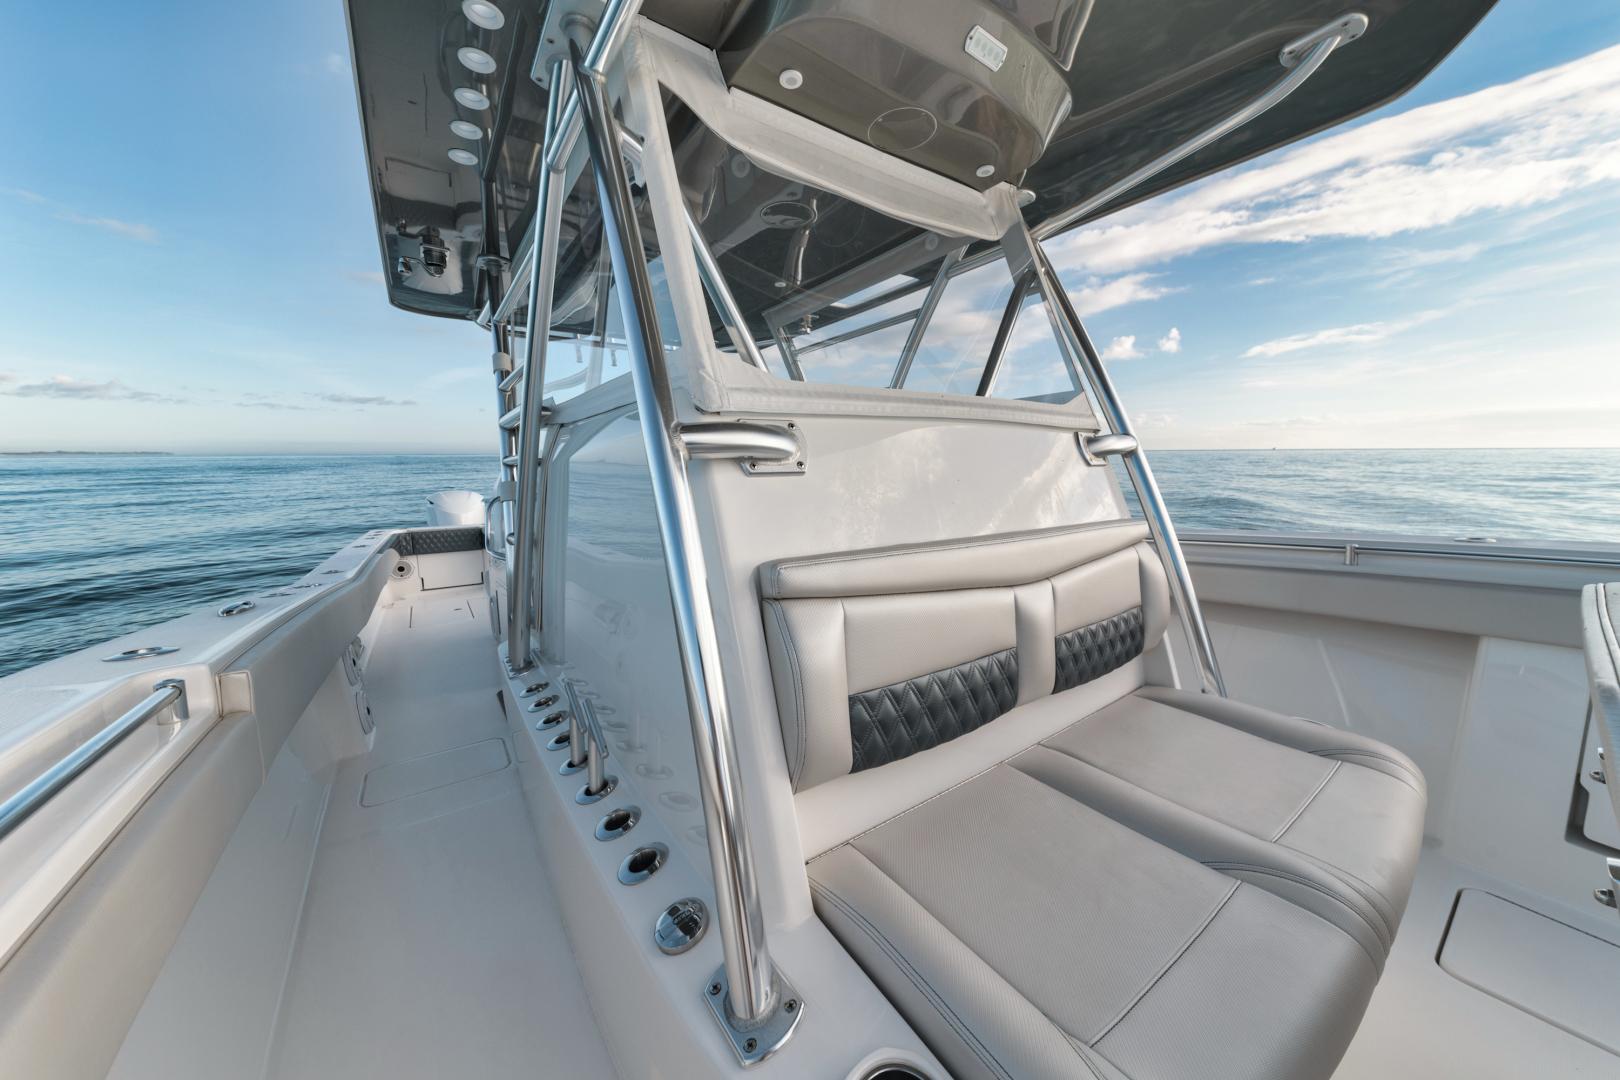 Invincible-Open Fisherman 2017-42 Invincible Jupiter-Florida-United States-1604195   Thumbnail